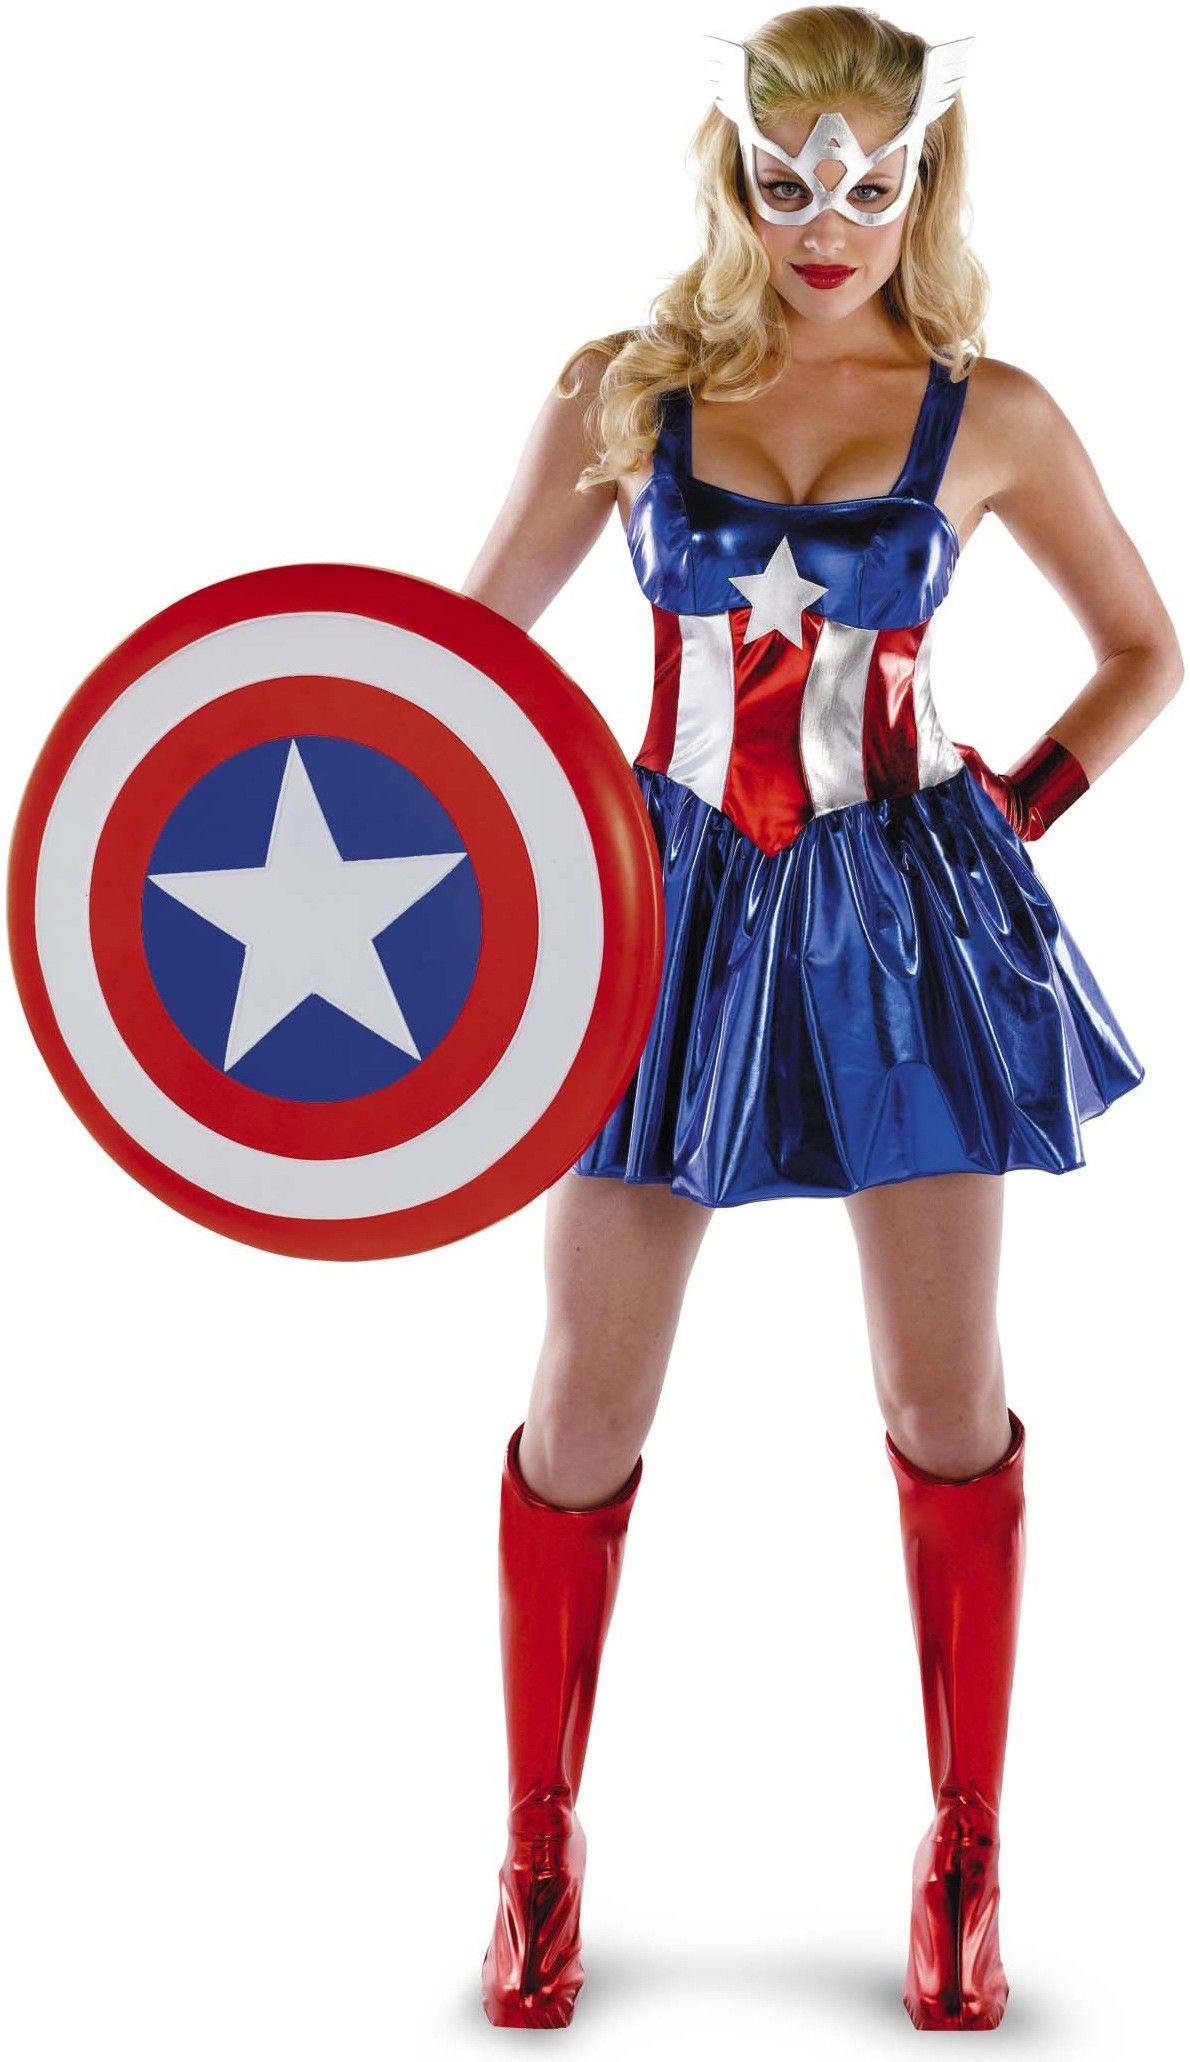 Adult Female Costumes | Costumes.com.au  sc 1 st  Pinterest & Adult Female Costumes | Costumes.com.au | Halloween Costumes Adult ...